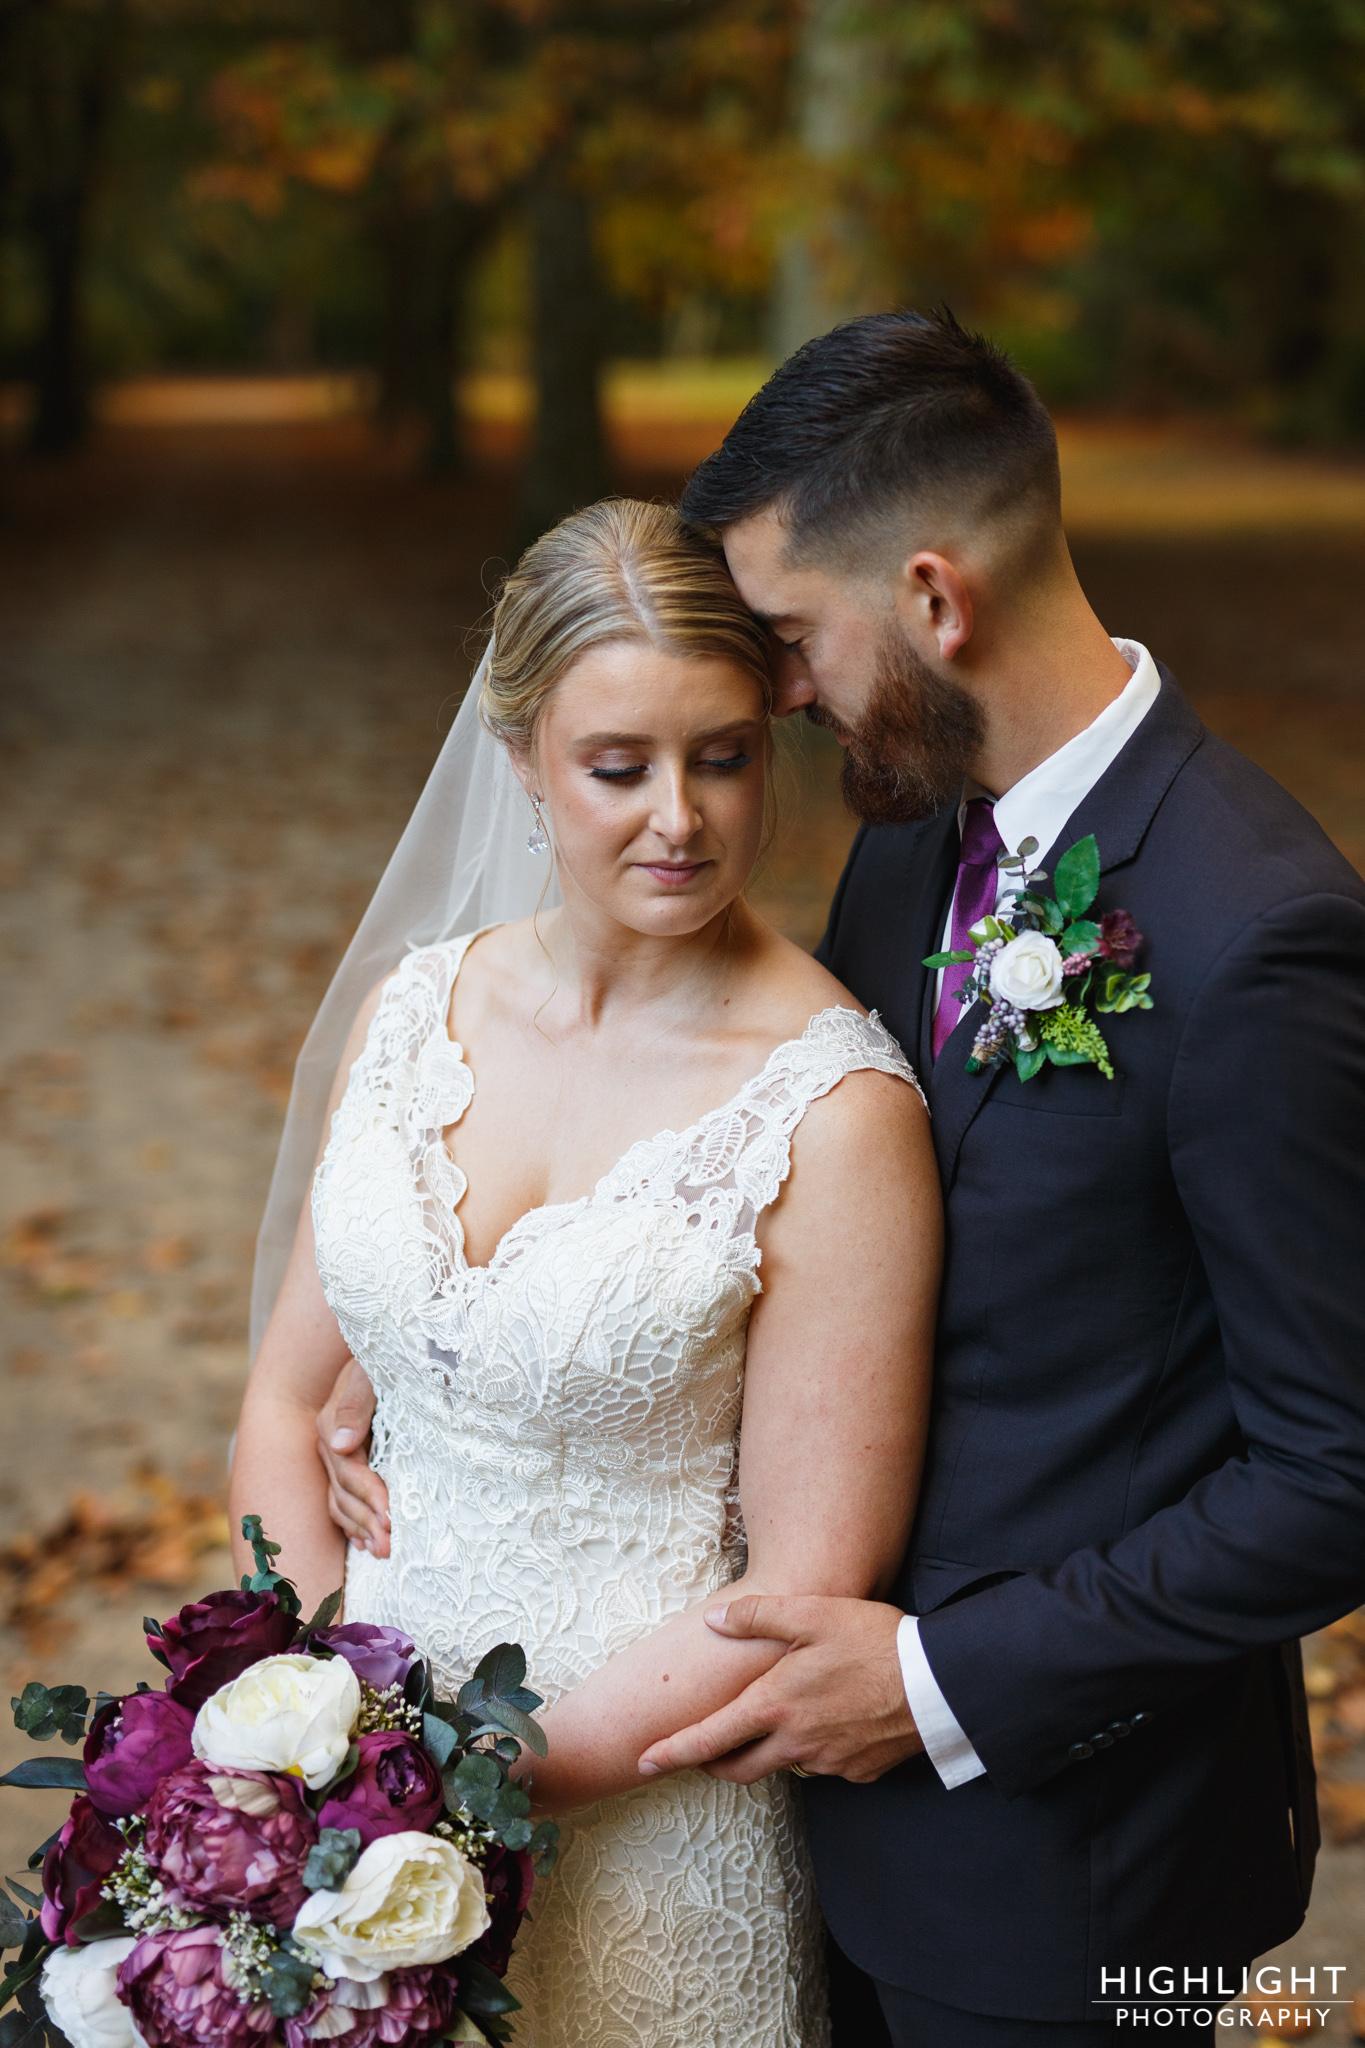 highlight-wedding-photography-feilding-new-zealand-154.jpg